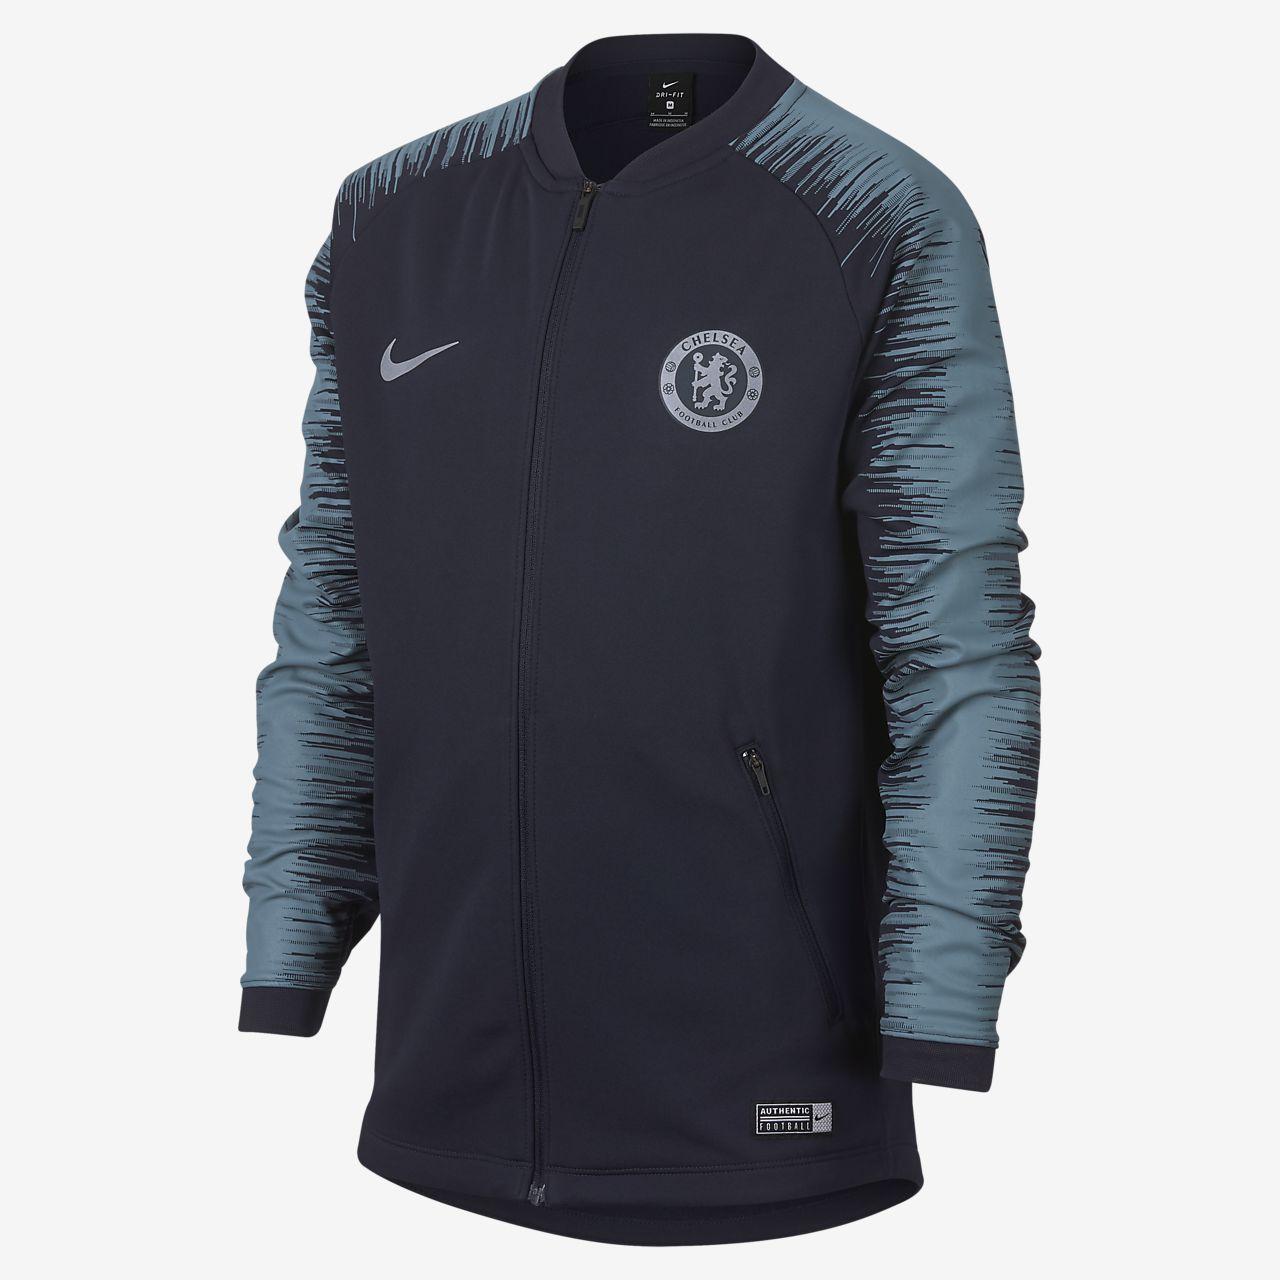 Chelsea FC Anthem Chaqueta de fútbol - Niño/a